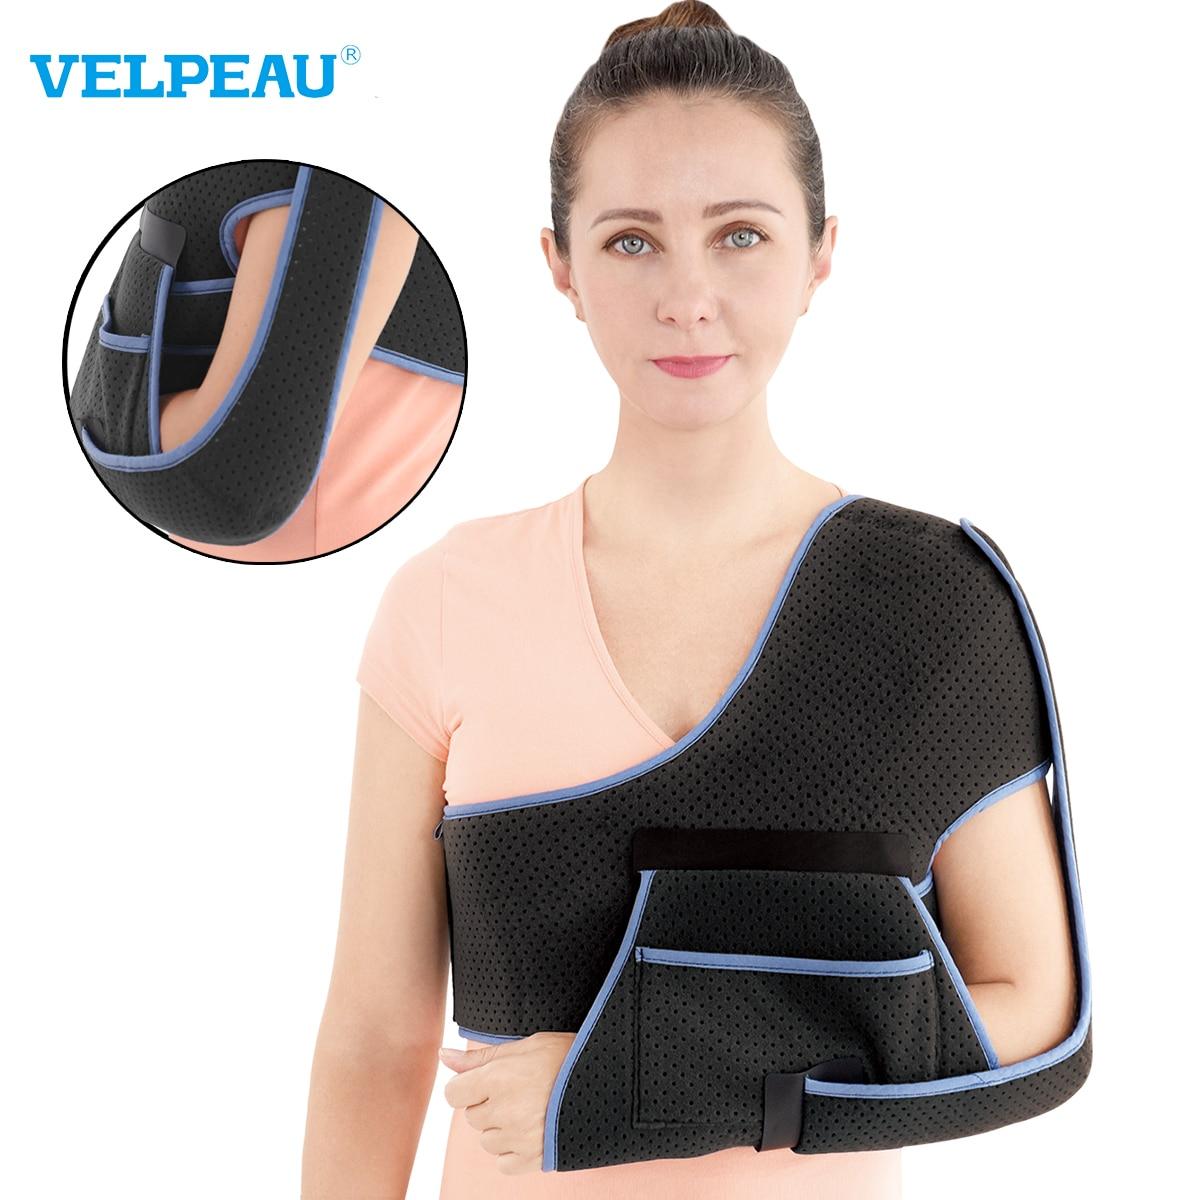 VELPEAU Shoulder Support Brace for Shoulder Arthritis Rheumatic Pain and Neurohemiplegia High-Streng